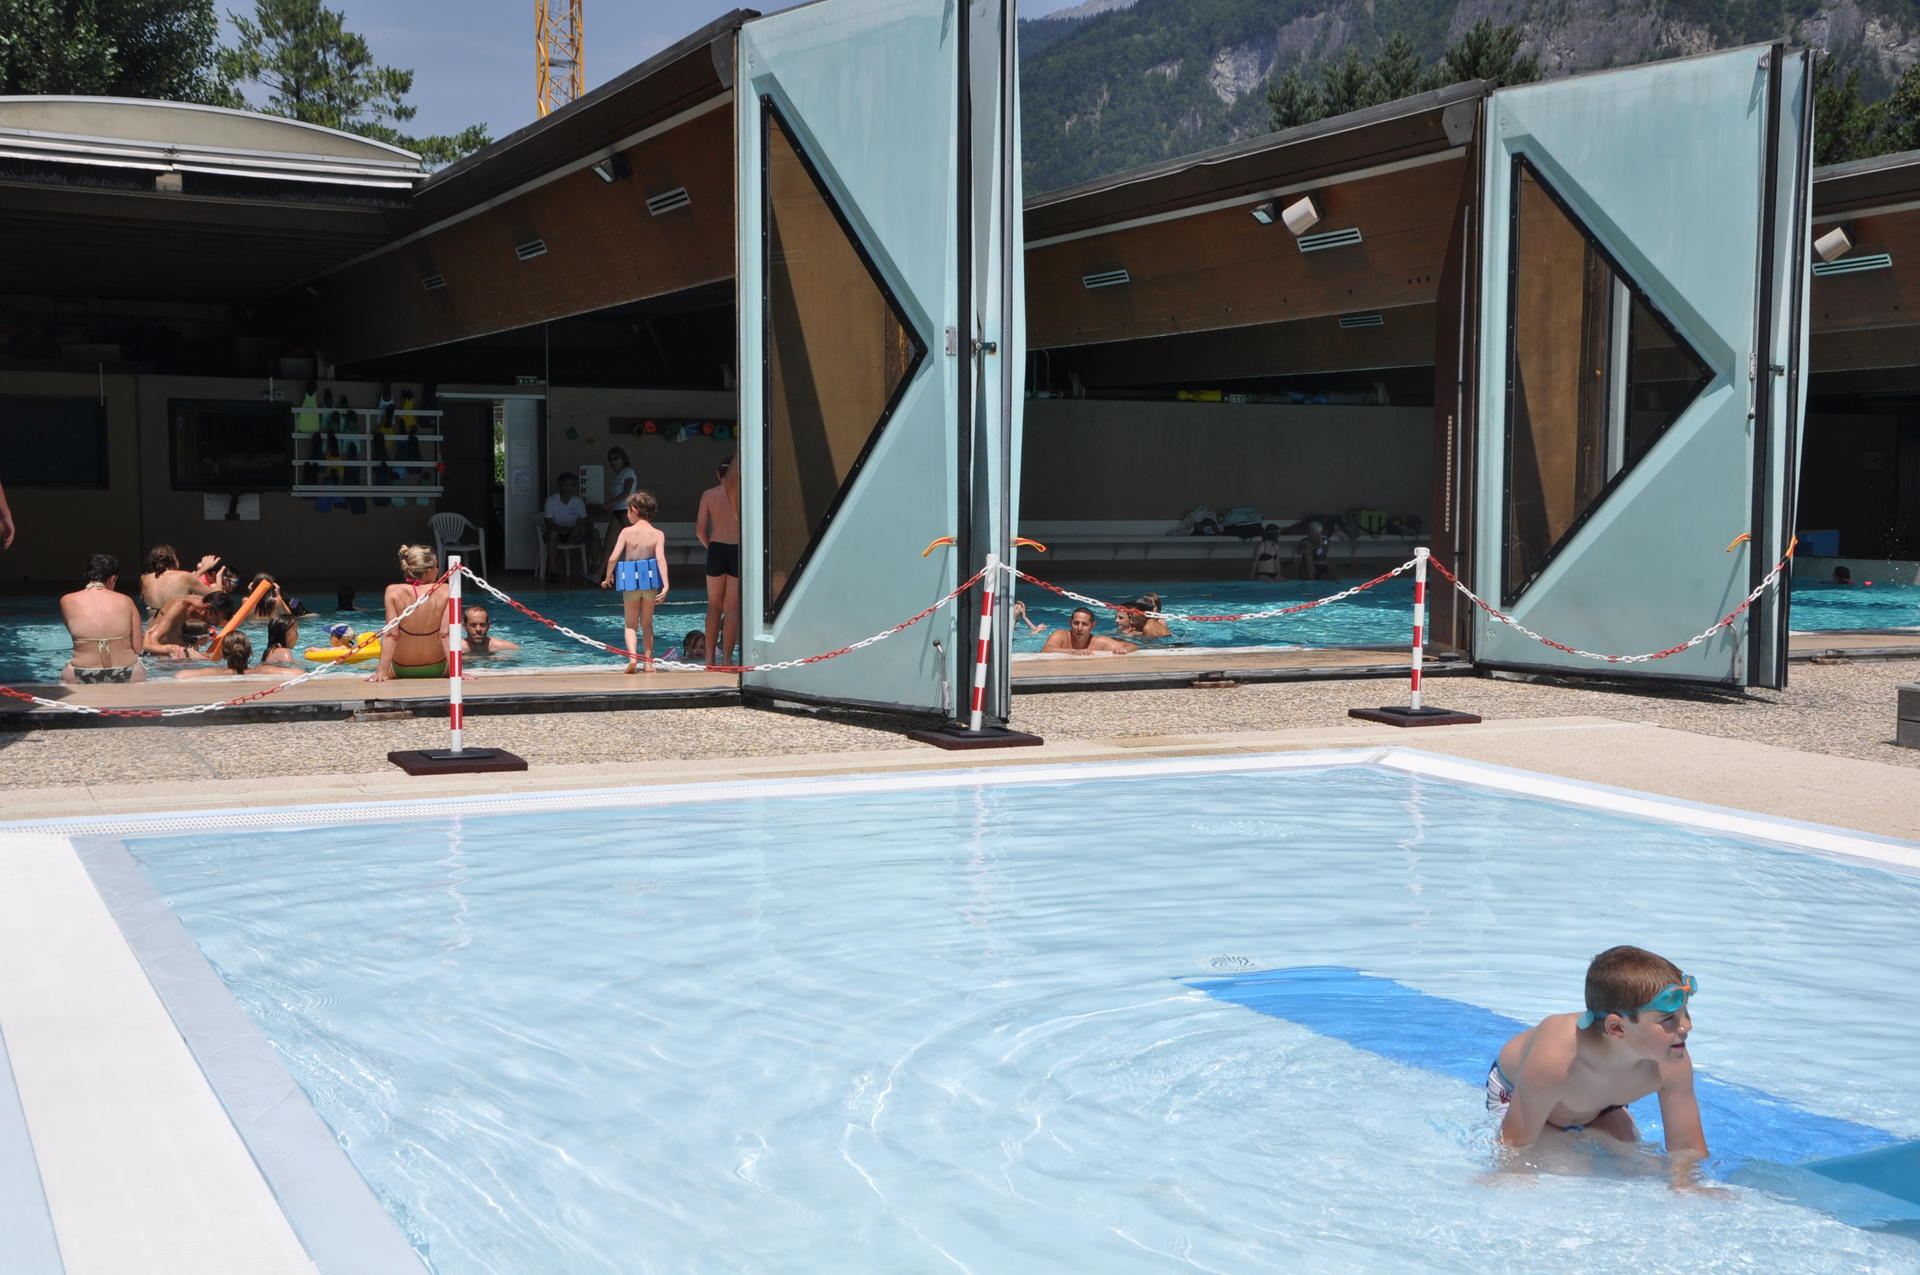 Summer Splash! – Waterslides, Wibit Games, Paddling Pools ... tout Piscine Sallanches